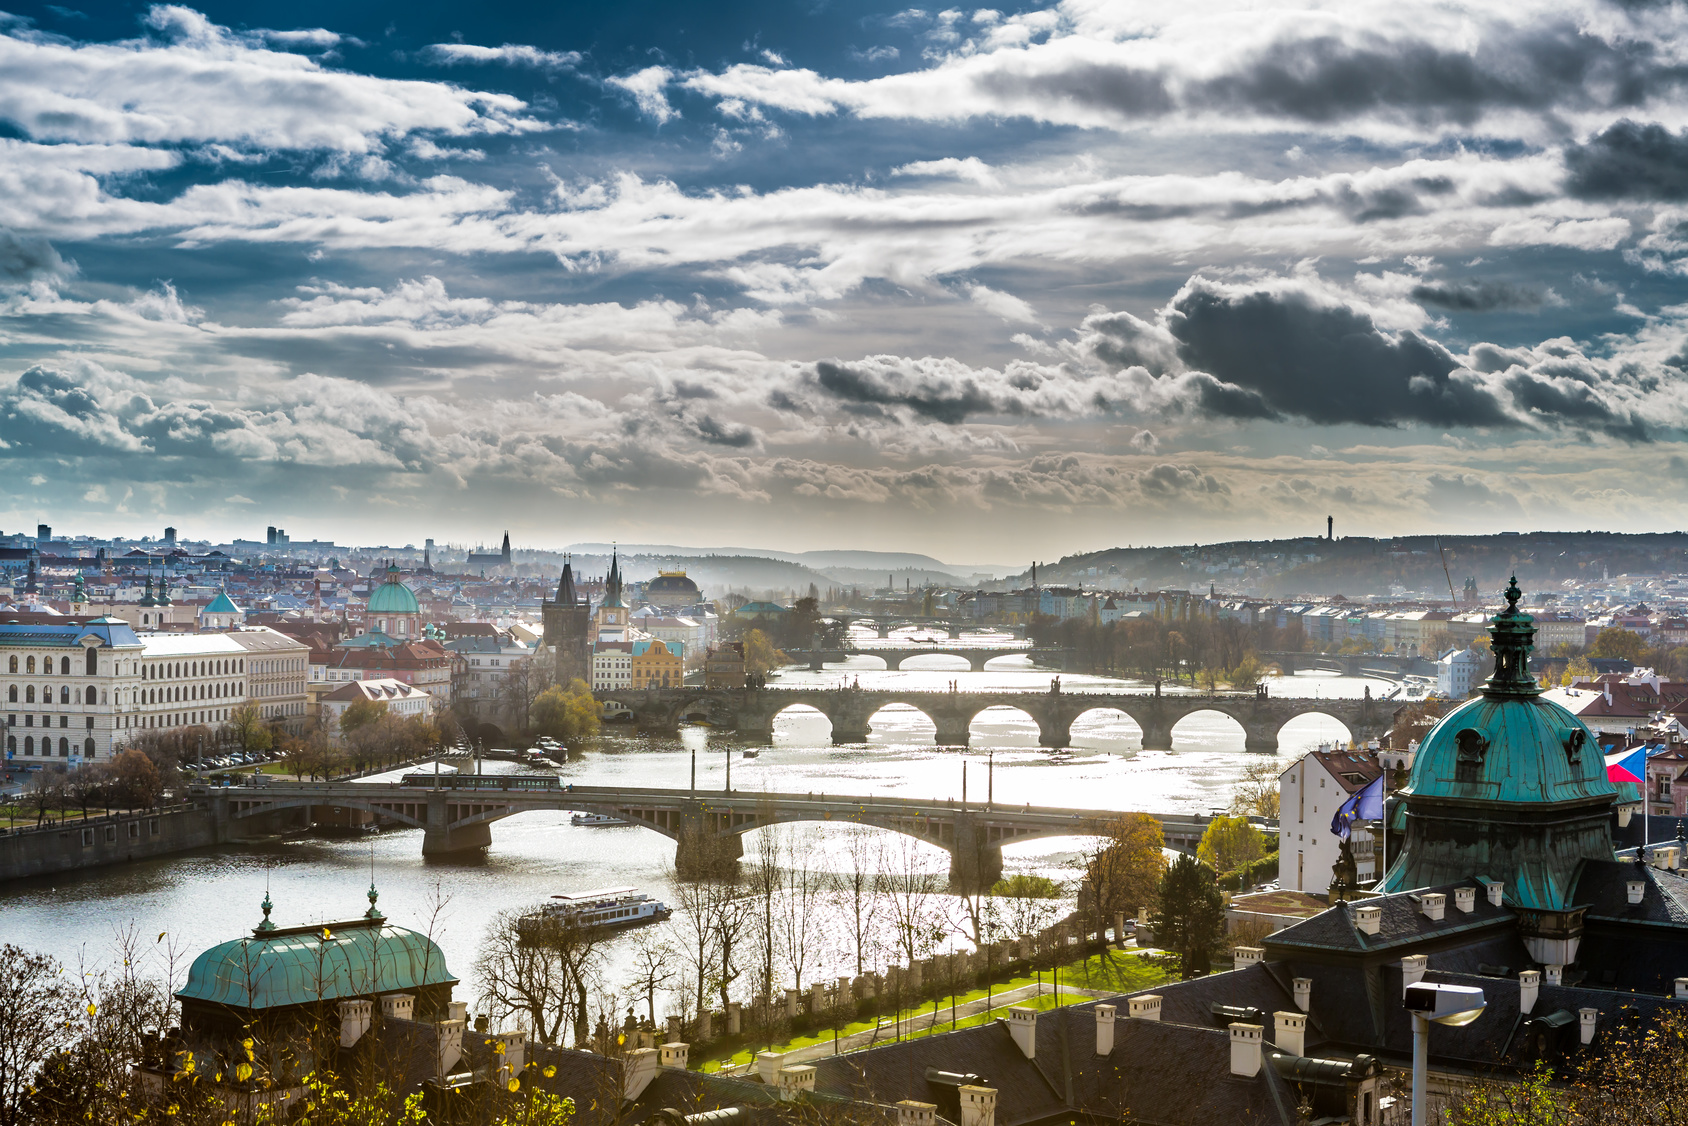 Prag Karte Sehenswurdigkeiten.Karlsbrucke In Prag Sehenswurdigkeiten Geschichte Bilder